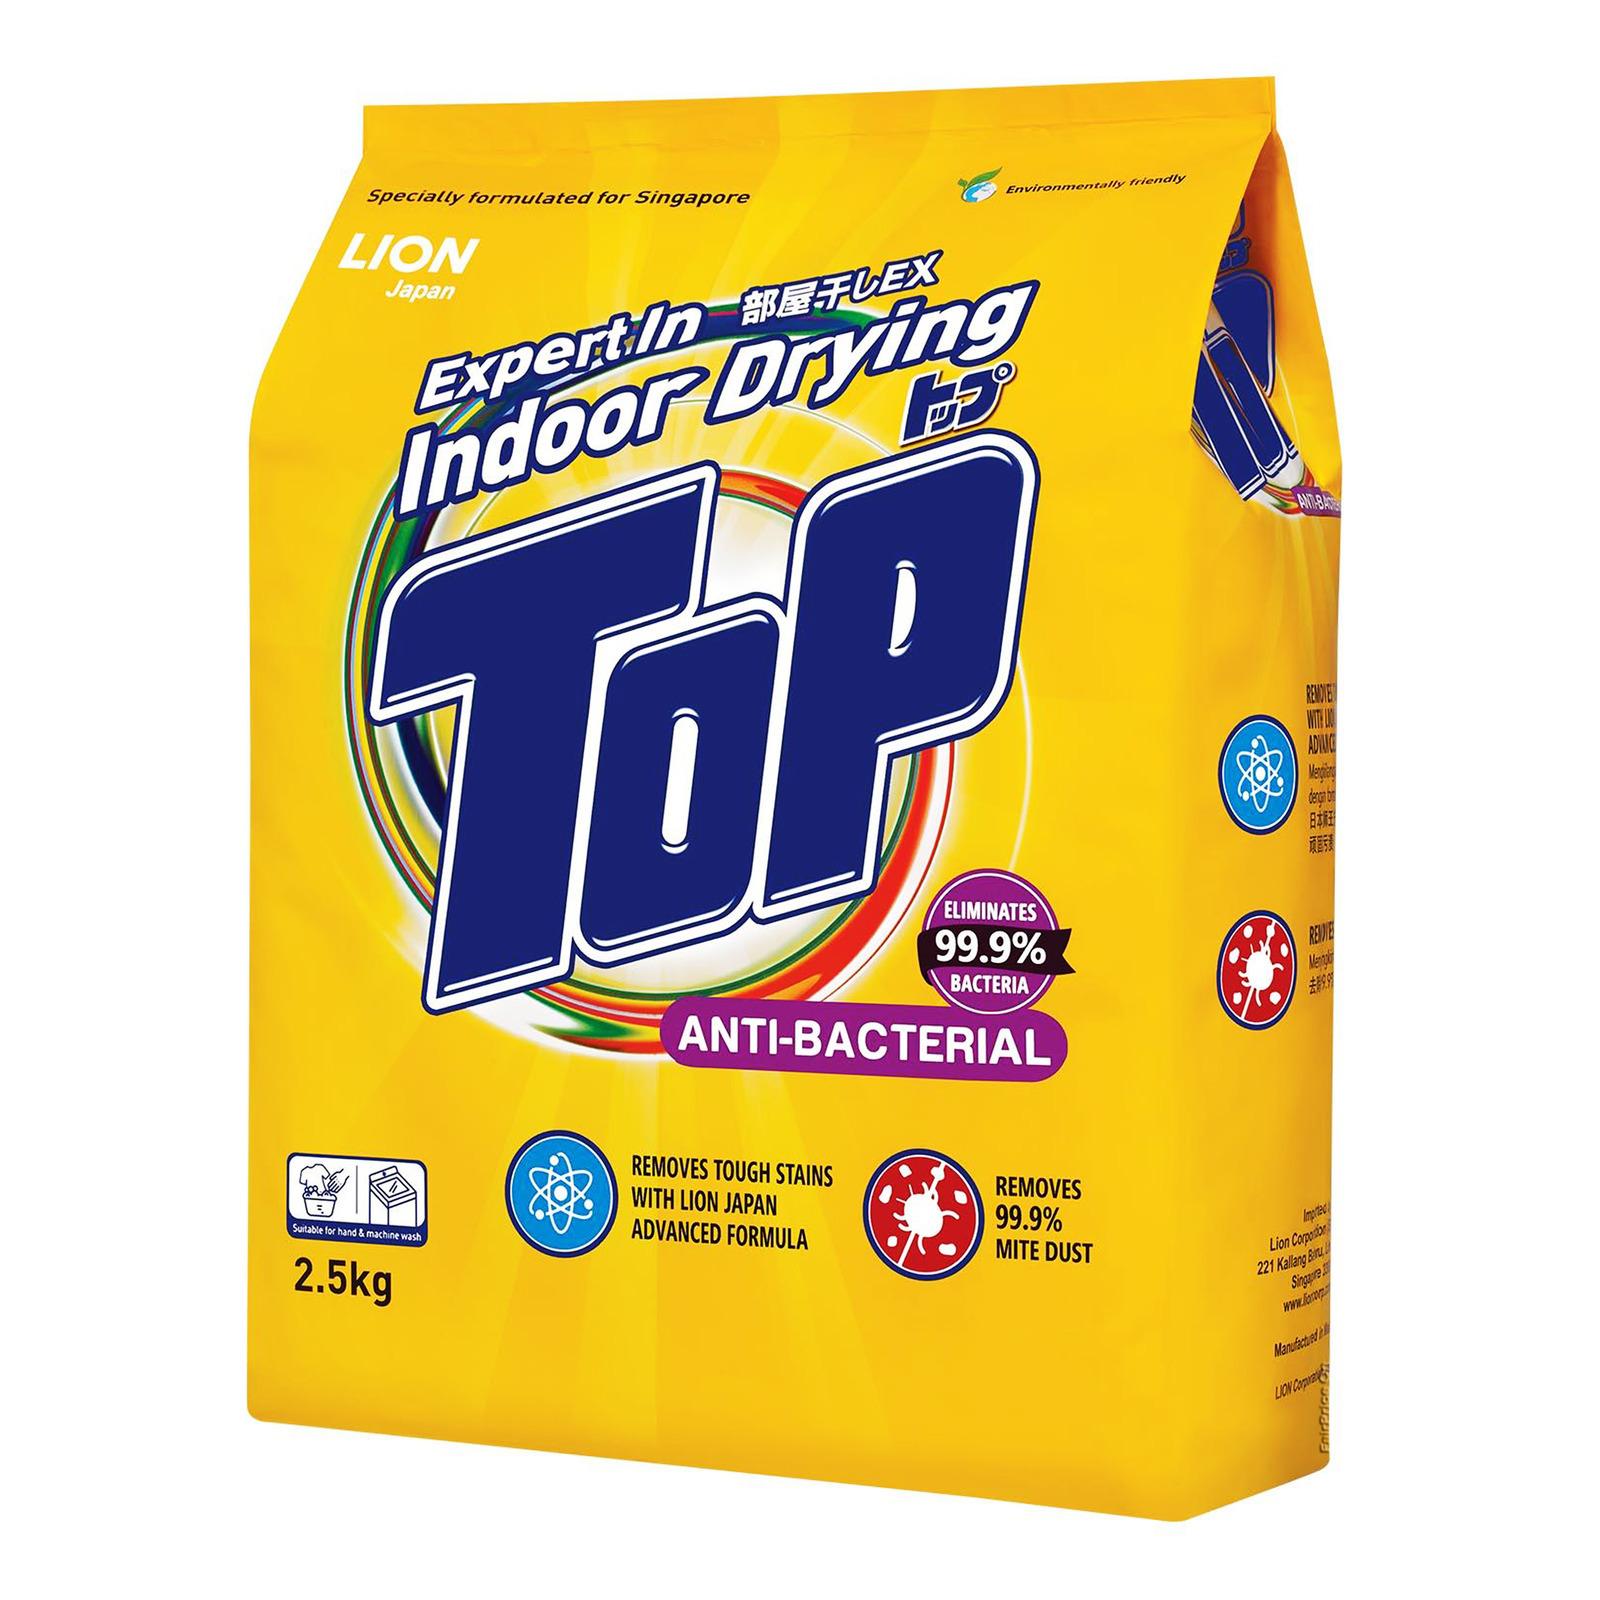 Top Detergent Powder - Anti-Bacterial